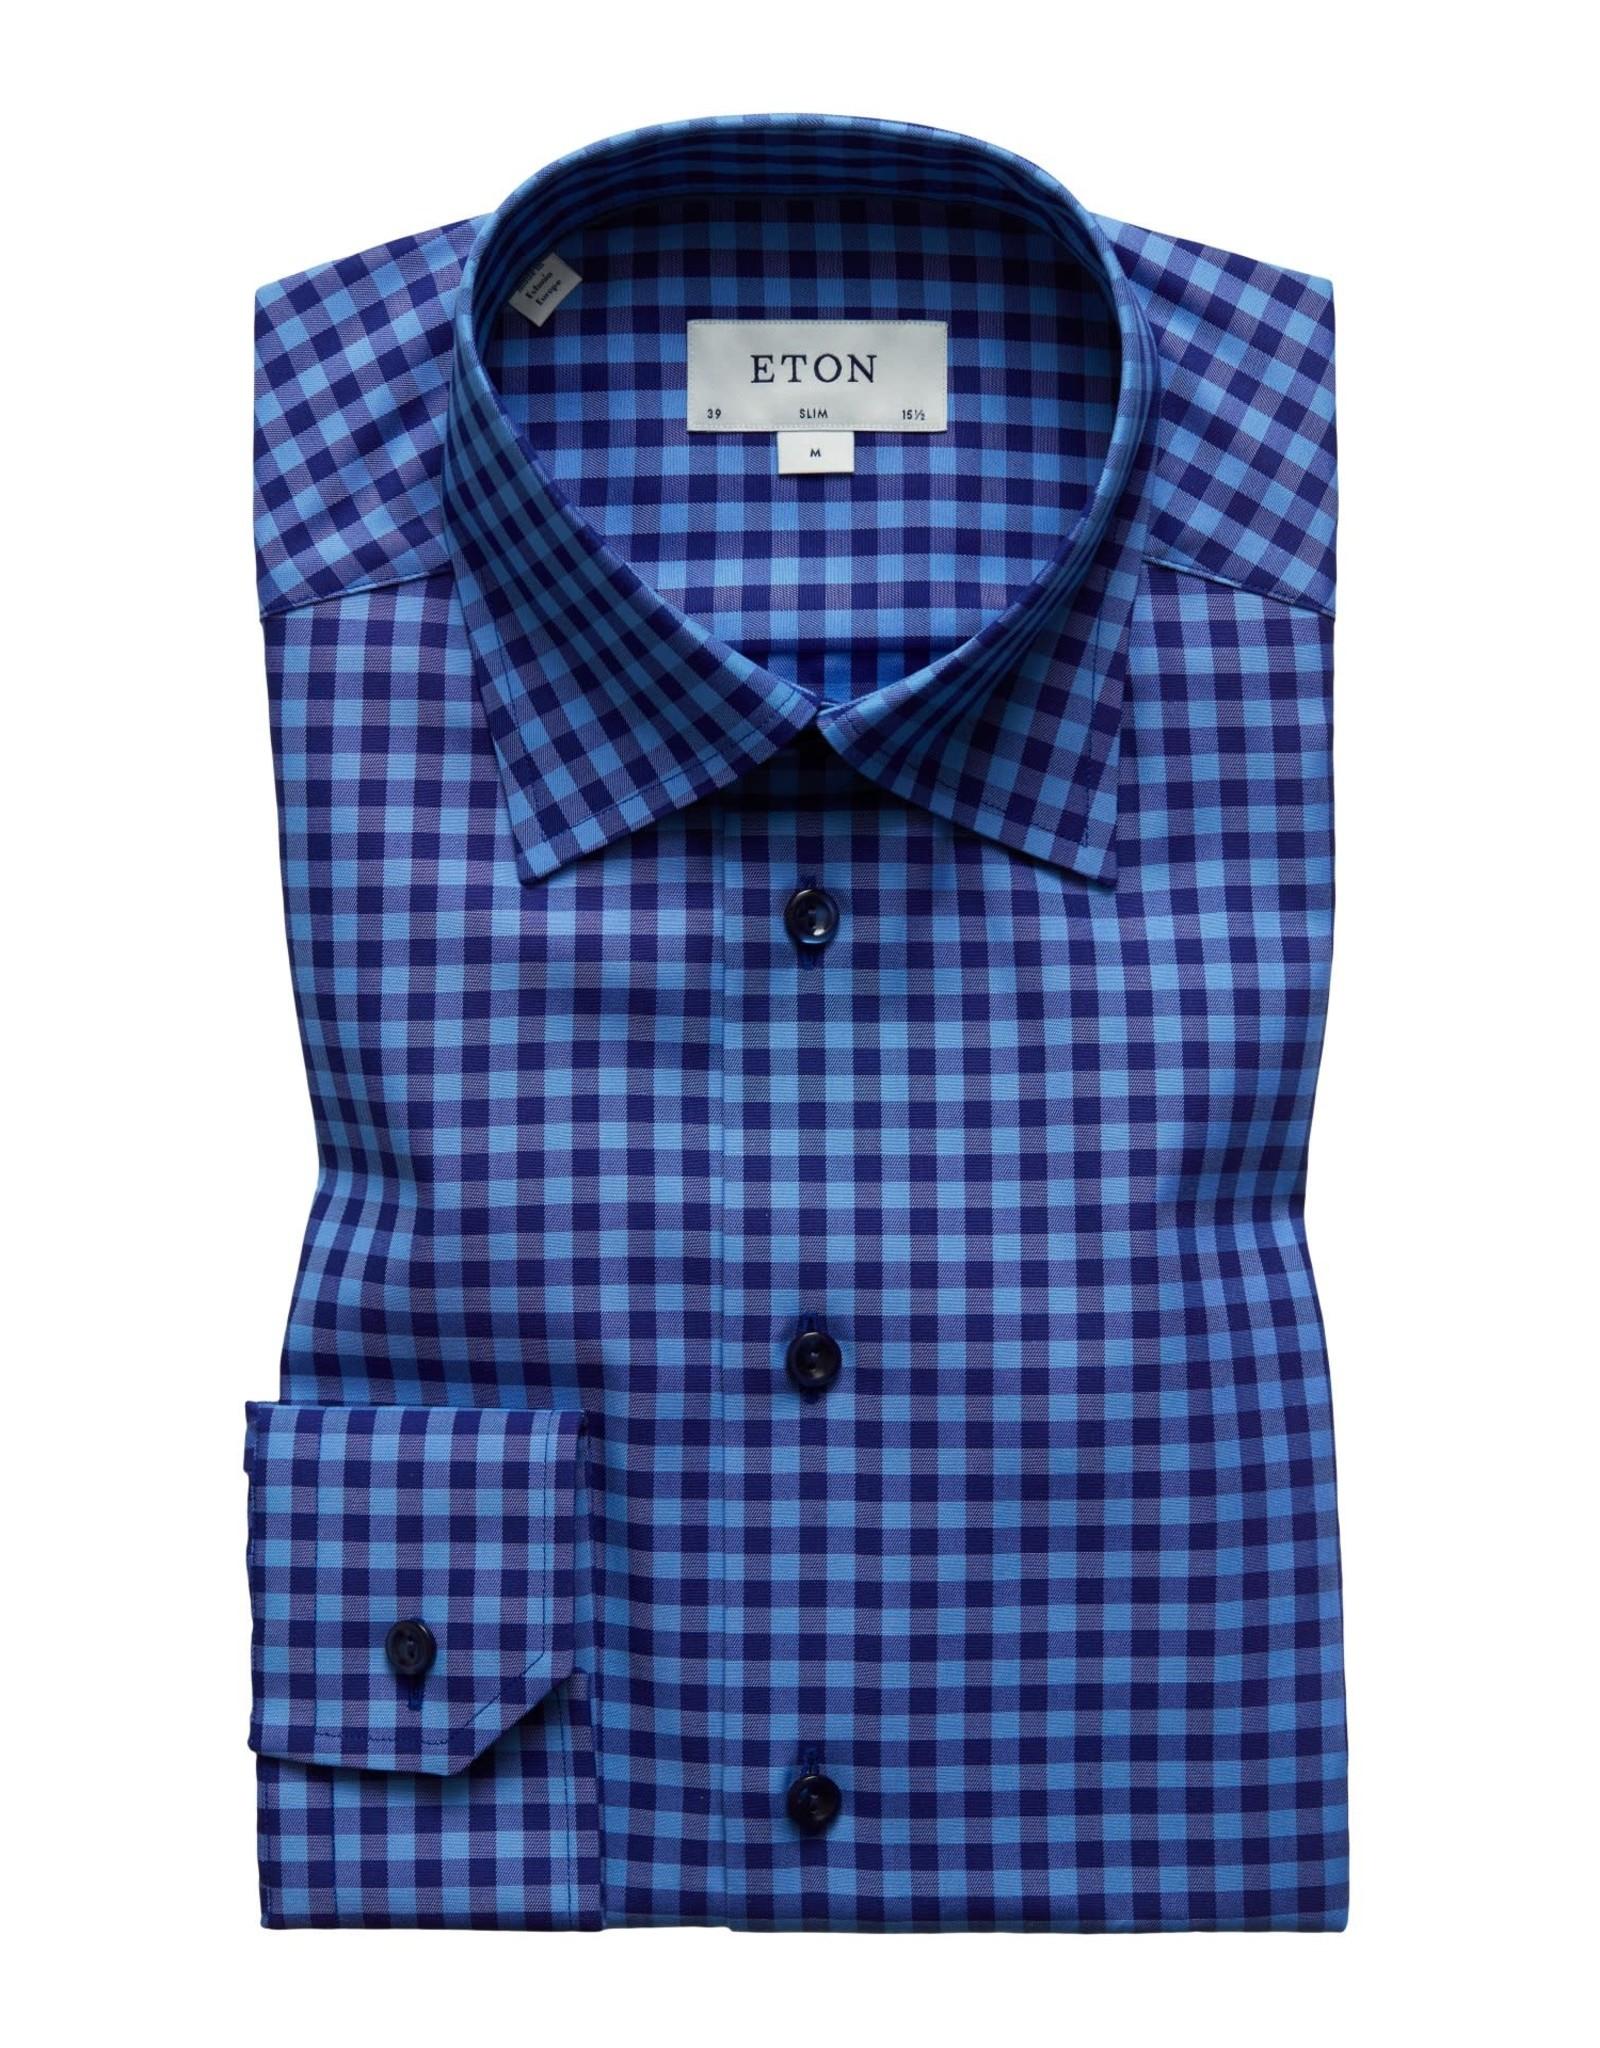 Eton Eton hemd blauw slimfit 3354-79544/25